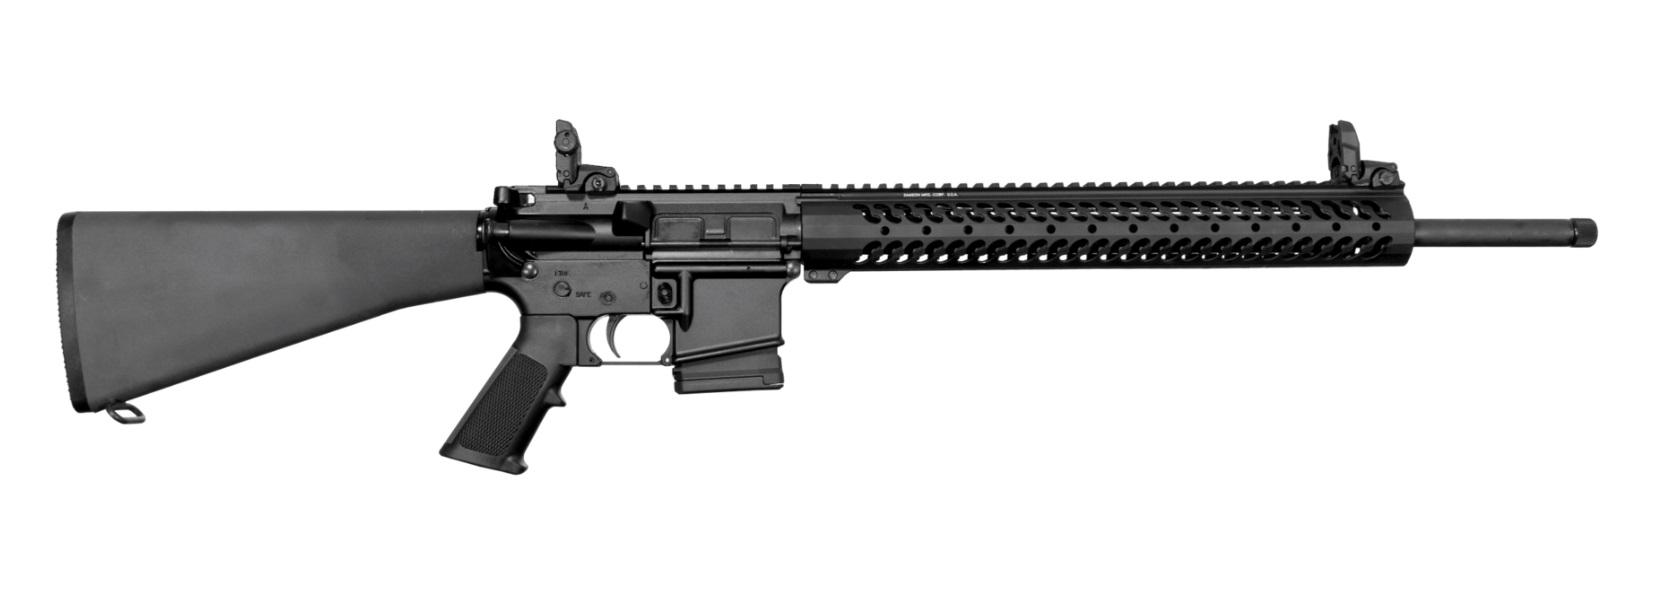 FN FN15 Heavy Rifle 223 Rem | 5.56 NATO